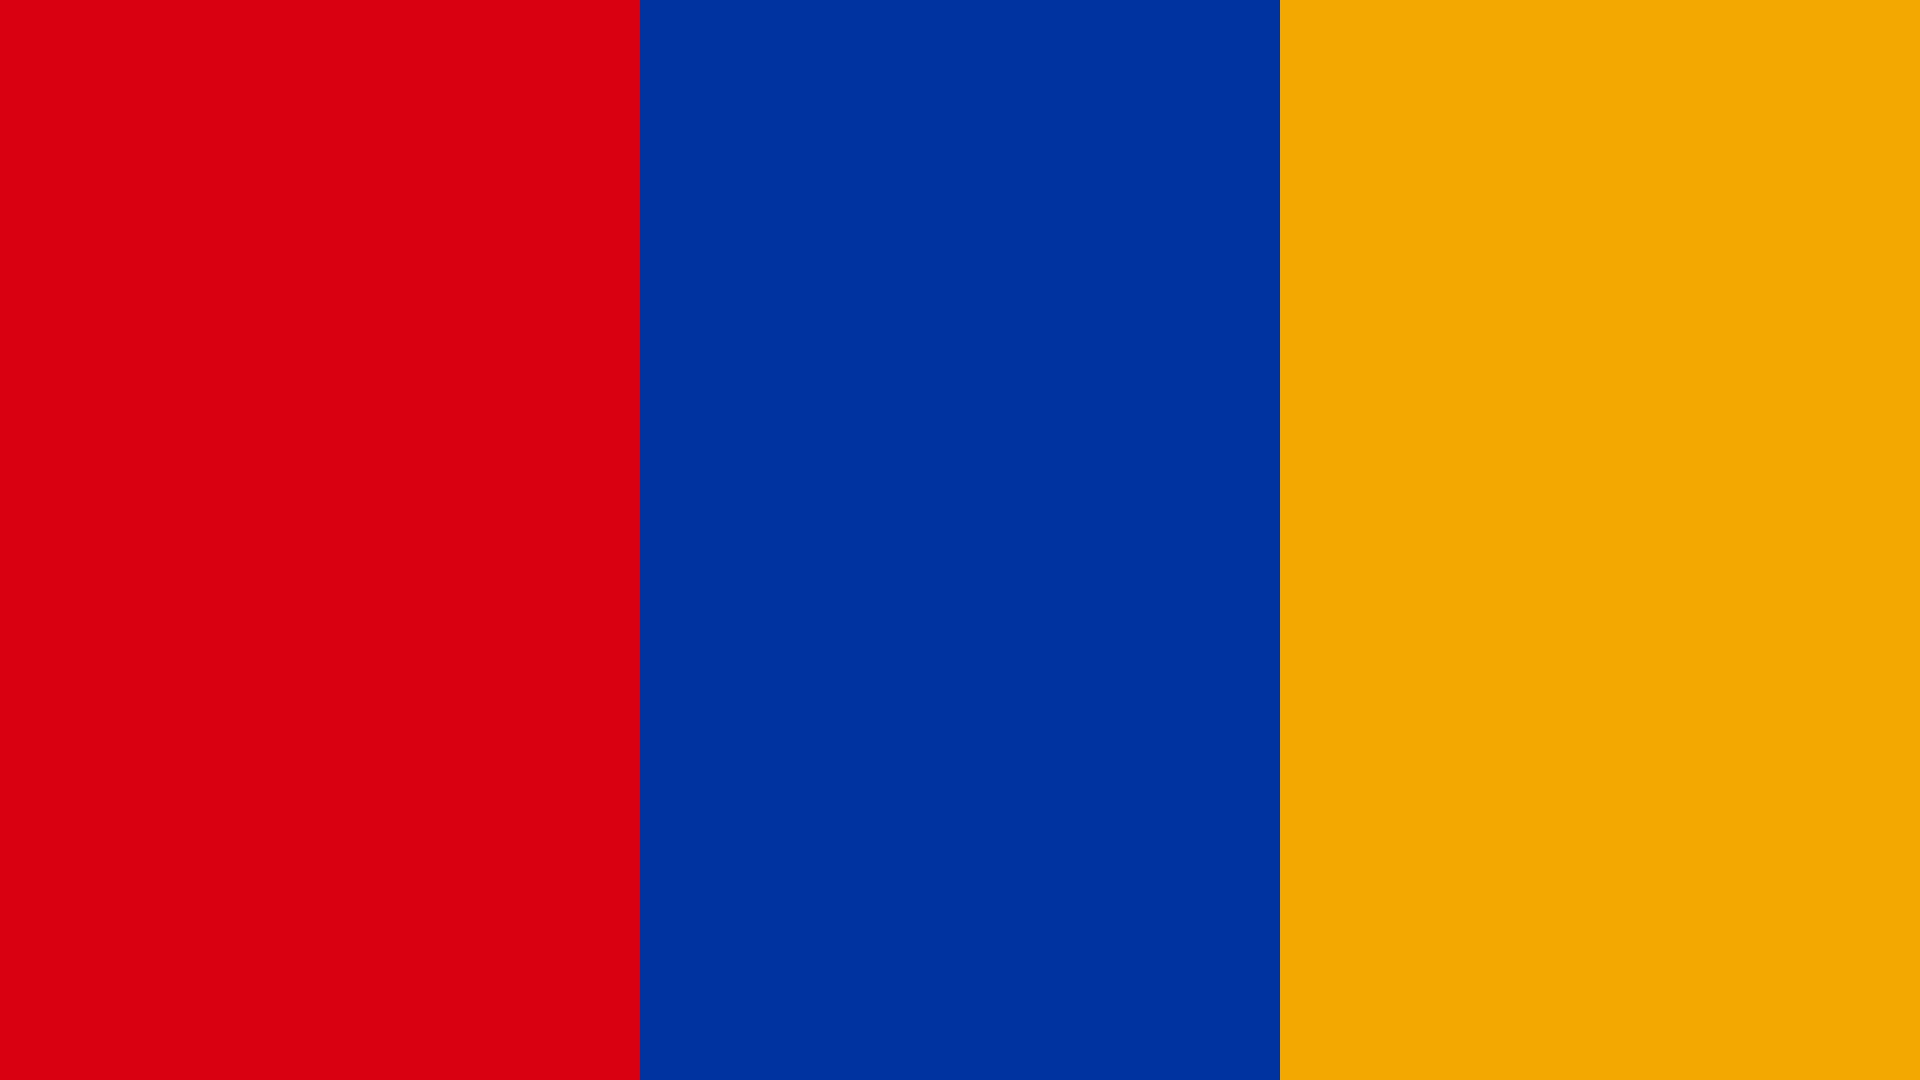 Armenia Flag Color Palette Flag Coloring Pages Flag Colors Armenia Flag